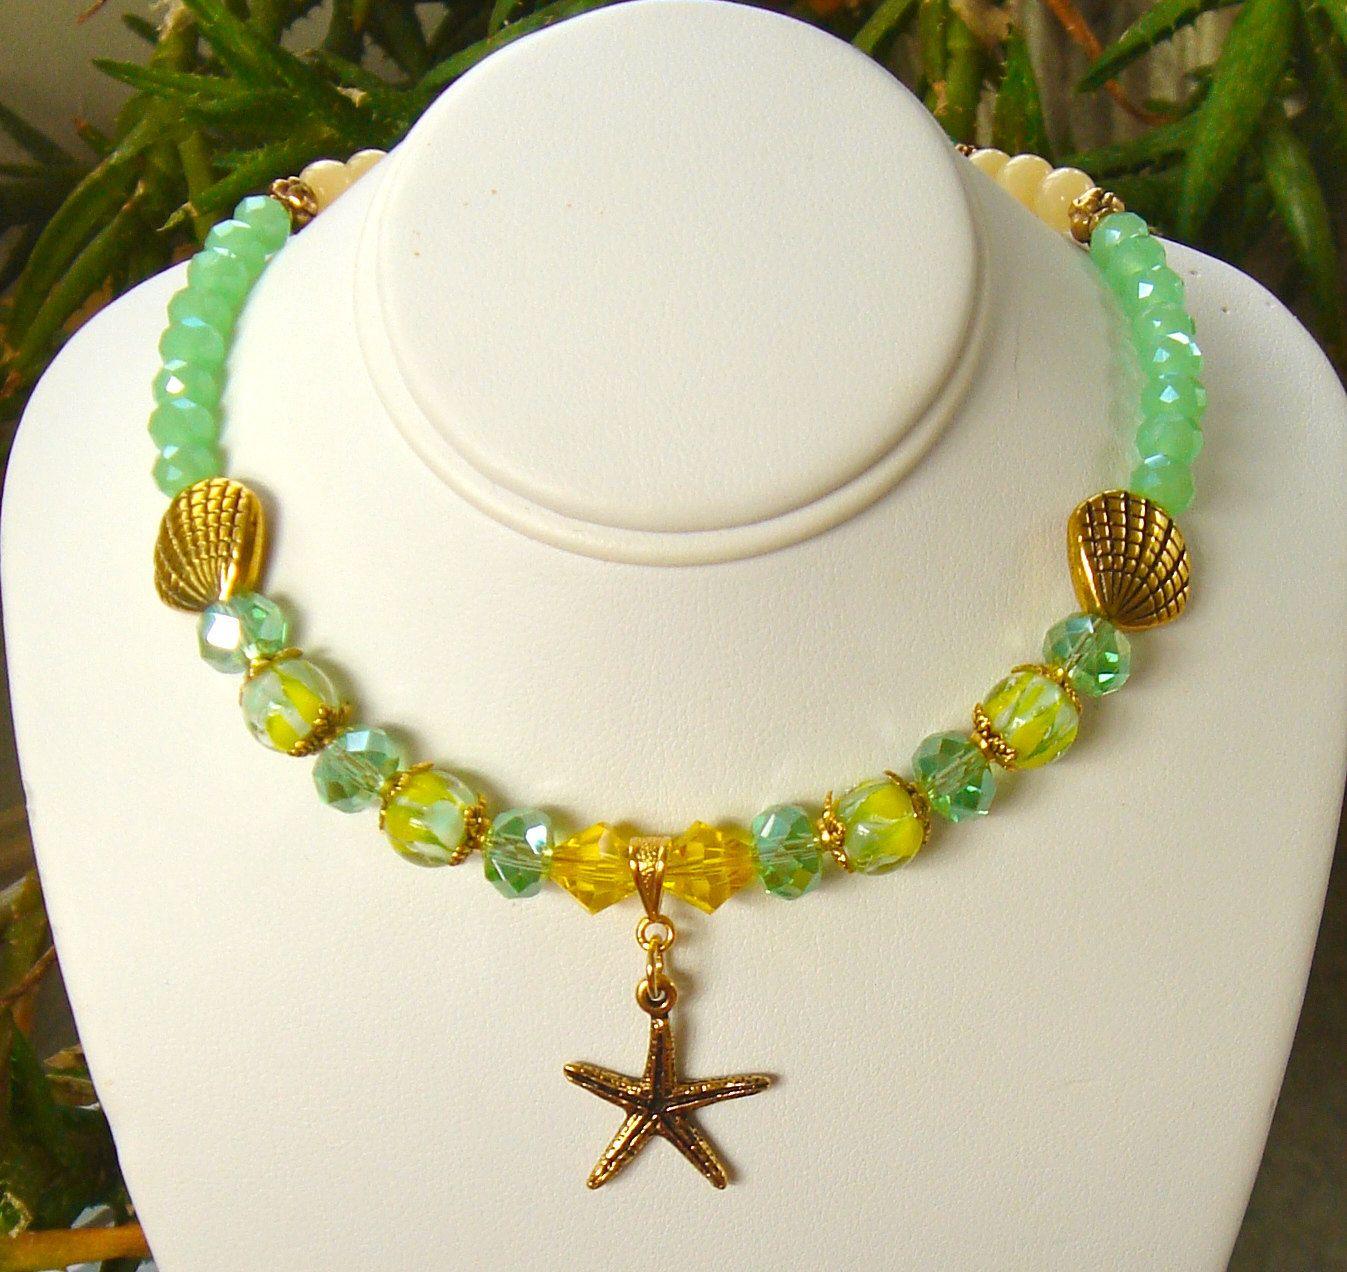 Swarovski Crystals Yellow Green Jade Lampwork Gold Seashell Starfish Necklace by Debra9 on Etsy